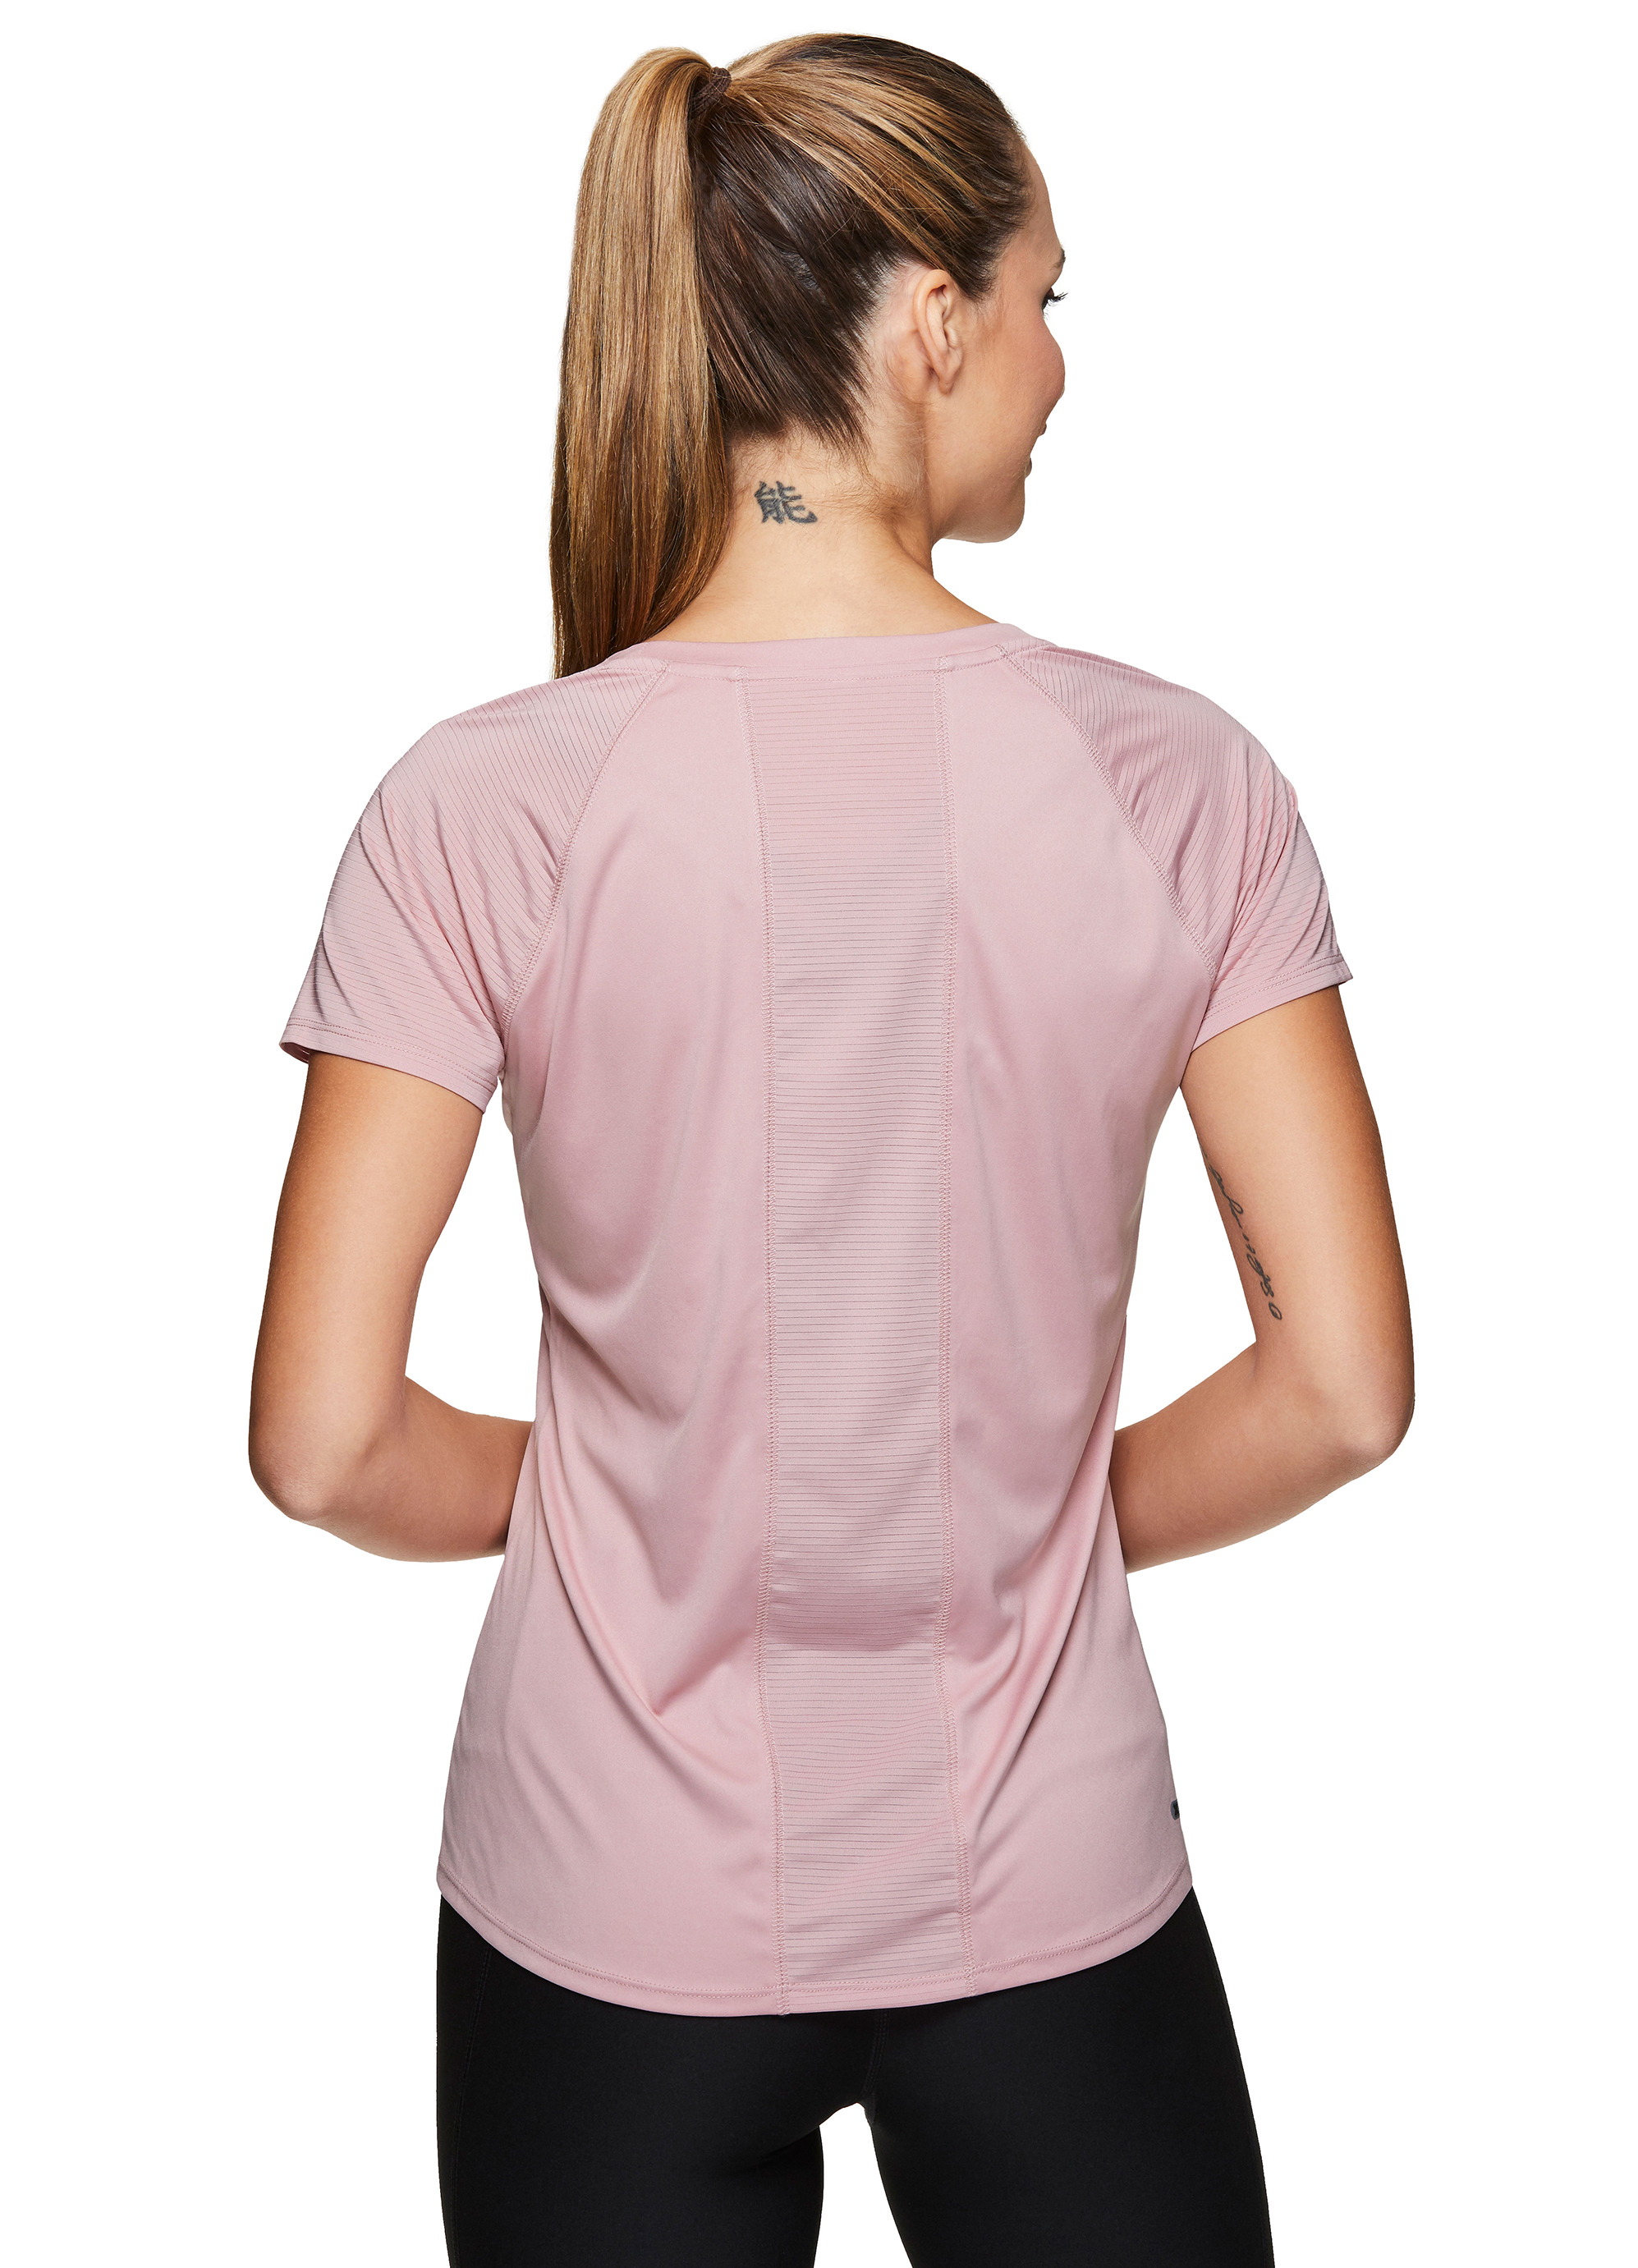 RBX Active Mens Athletic Performance Gym Workout Ventilated Mesh Short Sleeve Crewneck T-Shirt